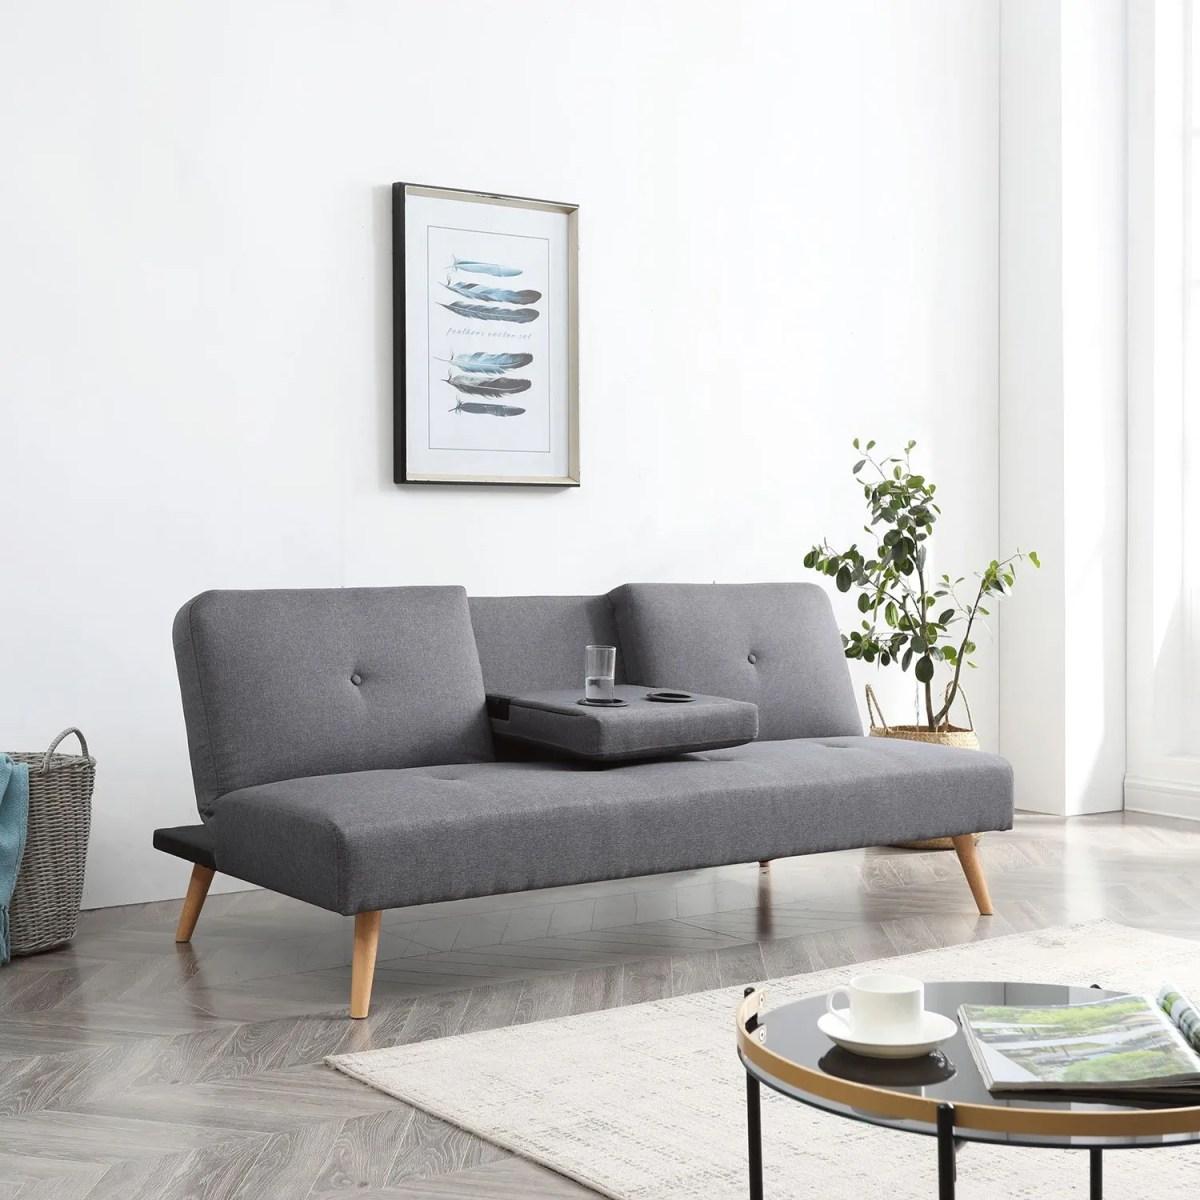 sofacama reclinable individual portavasos bossa hobbs 4